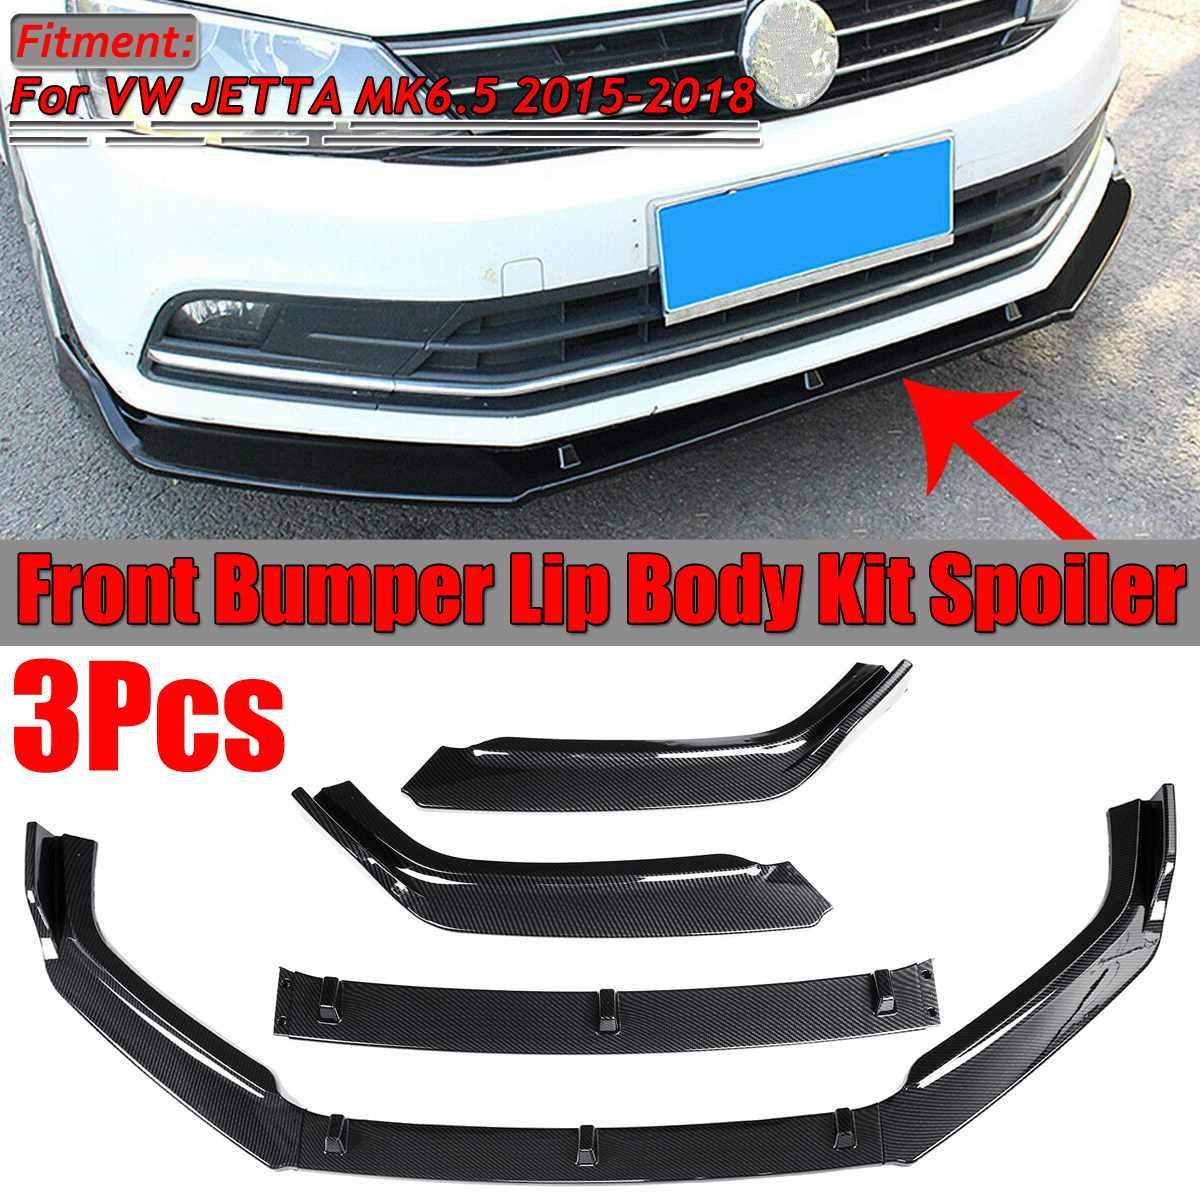 3Pcs Auto Front Lip Splitter Lippe Kinn Auto Diffusor Spoiler Splitter Körper Kit Für VW JETTA MK6.5 2015 2016 2017 2018